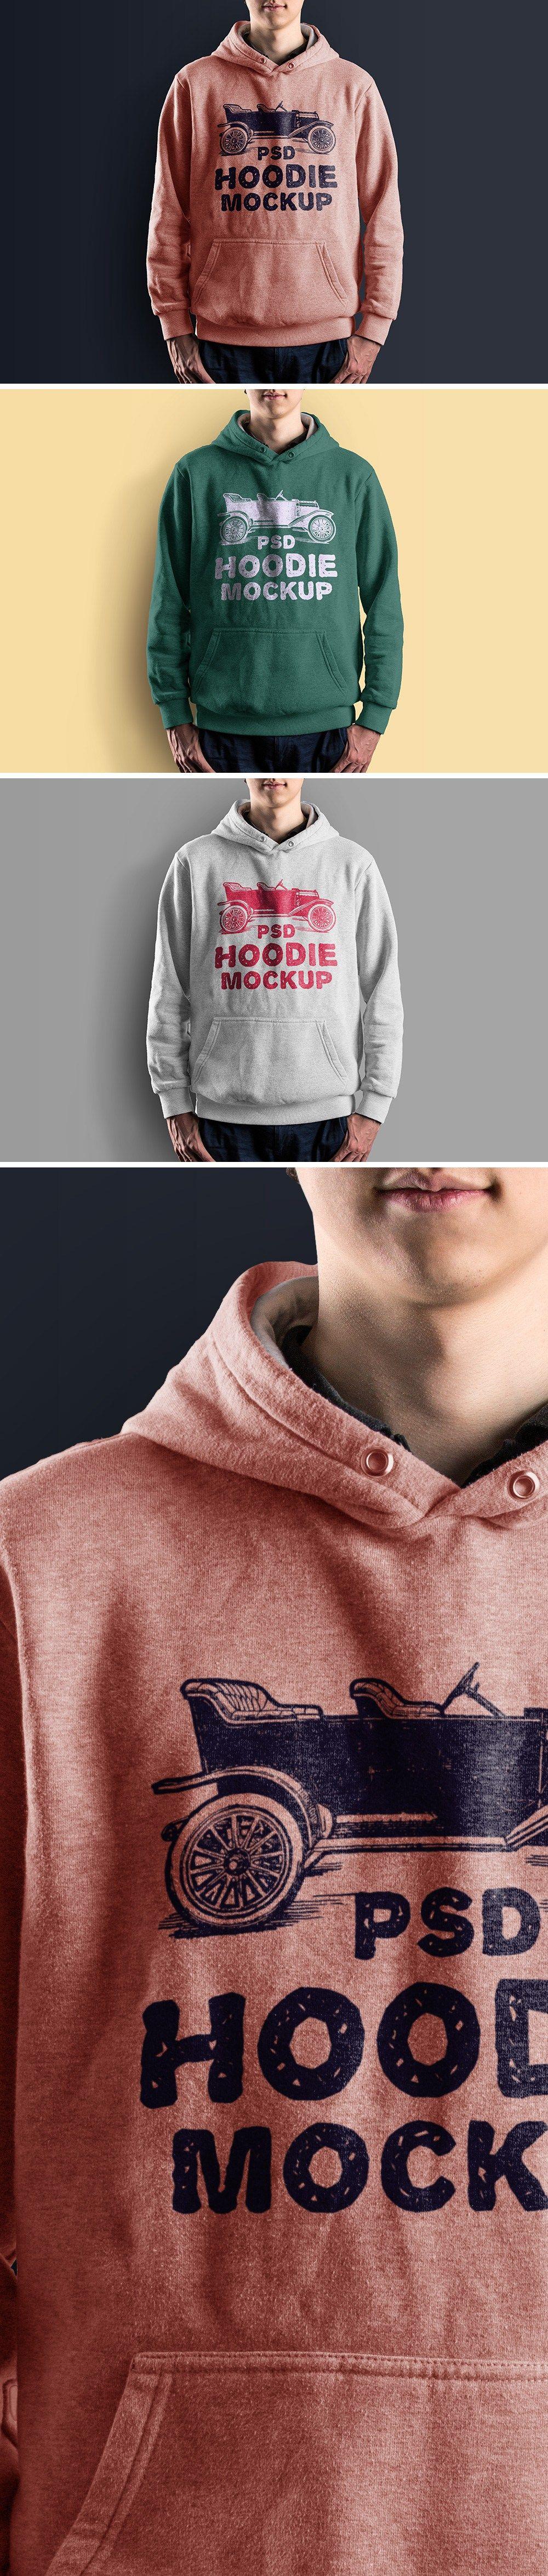 Download Hoodie Mockup Psd Hoodie T Shirt Desain Pakaian